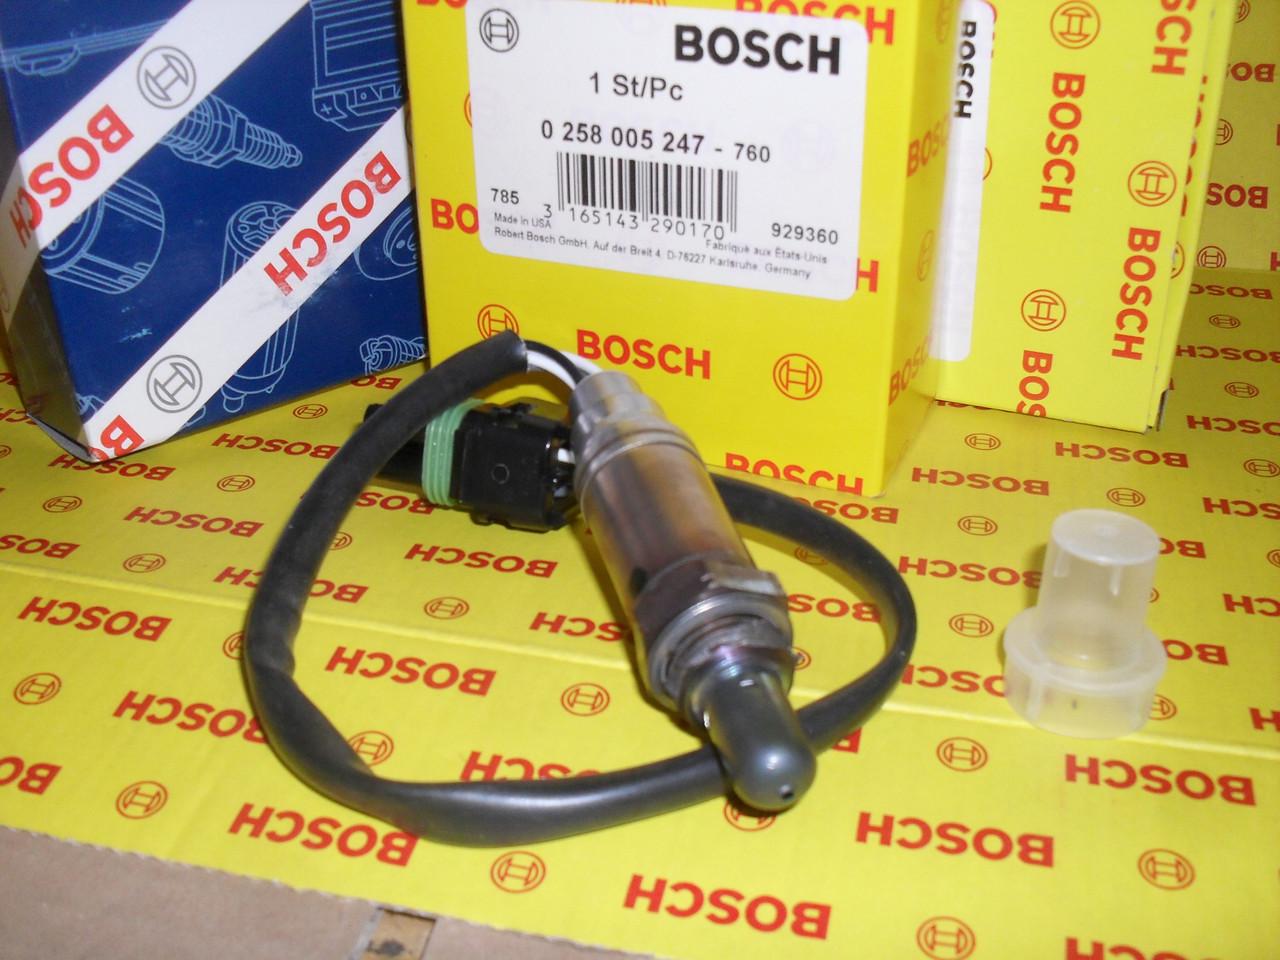 Лямбда-зонд Bosch 0258005247, лямбда ВАЗ 2110 после катализатора, 0 258 005 247,